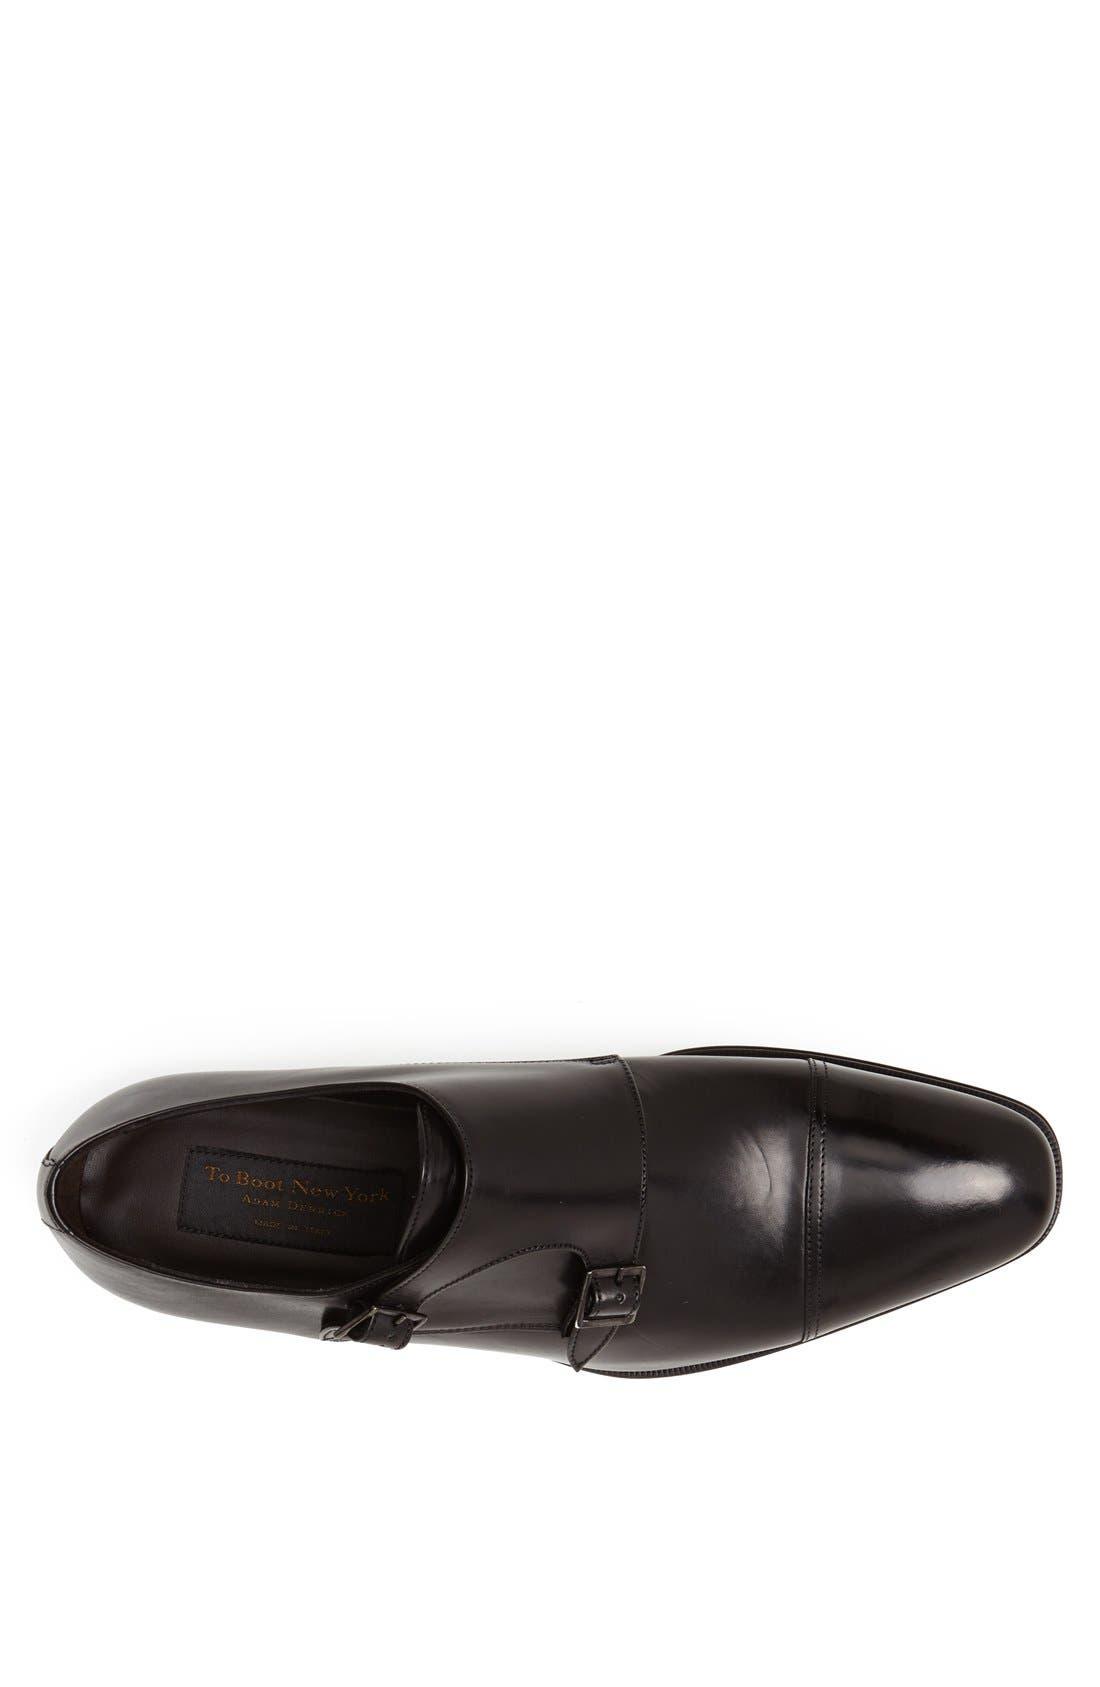 TO BOOT NEW YORK, 'Grant' Double Monk Shoe, Alternate thumbnail 4, color, BLACK CALFSKIN